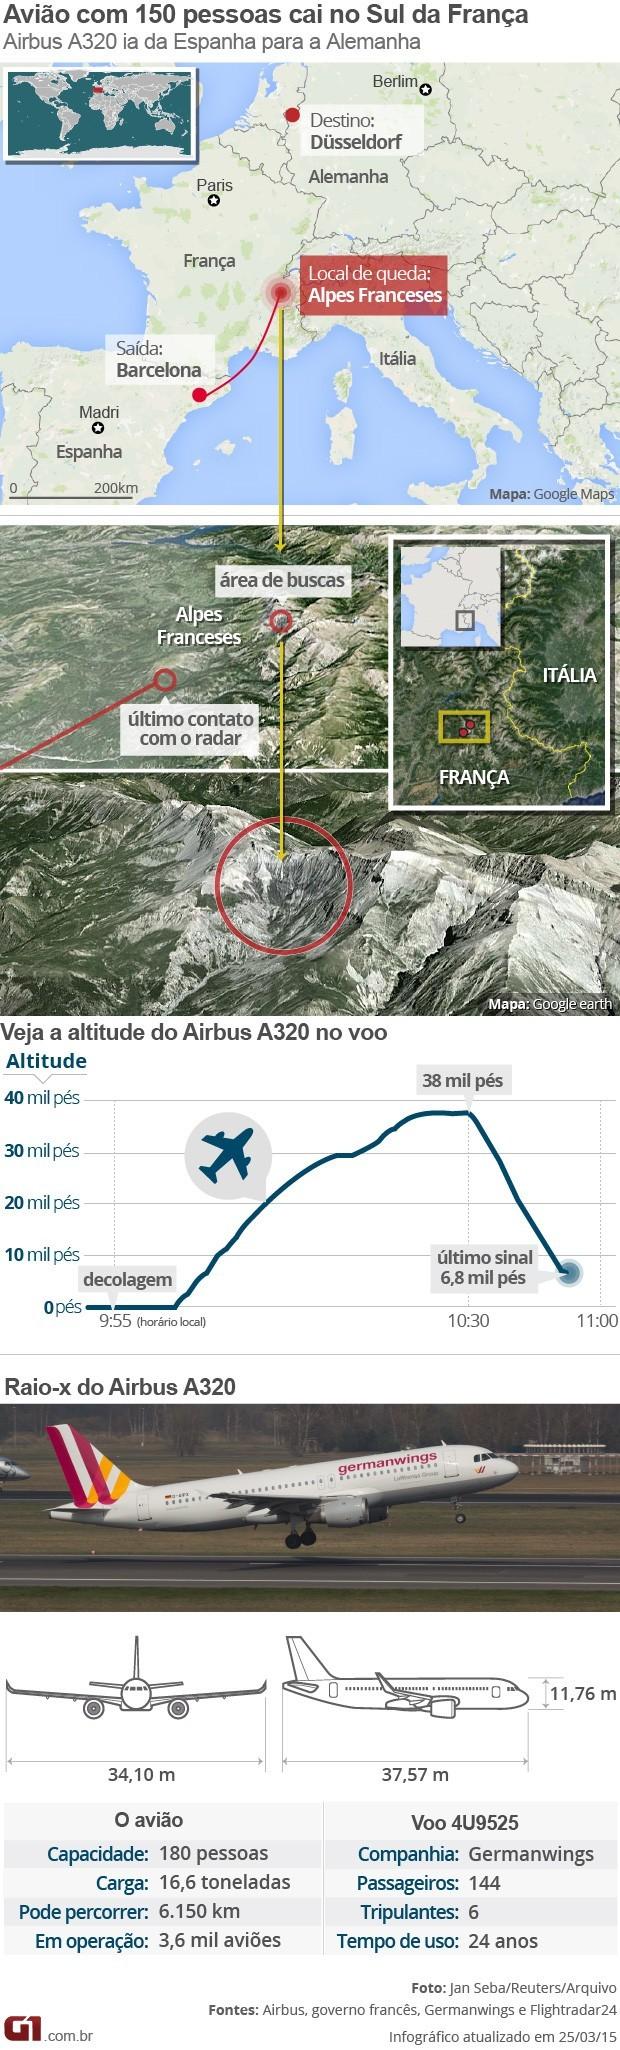 Promotoria francesa diz que copiloto teria derrubado avio deliberadamente